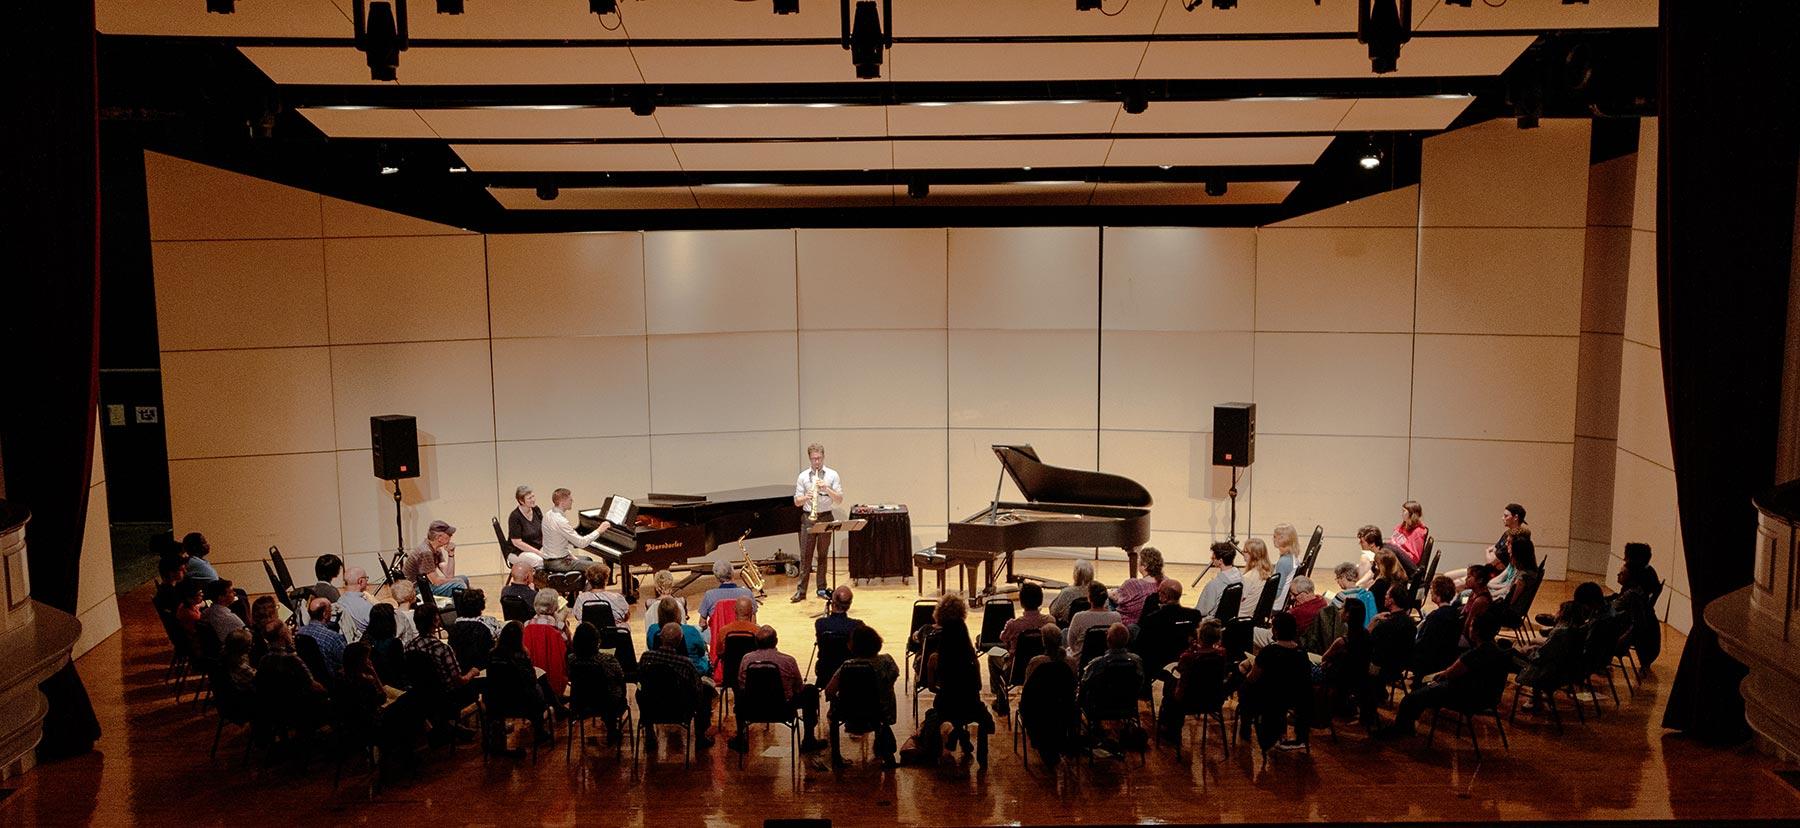 Saxaphone and piano duet in Marshall Auditorium